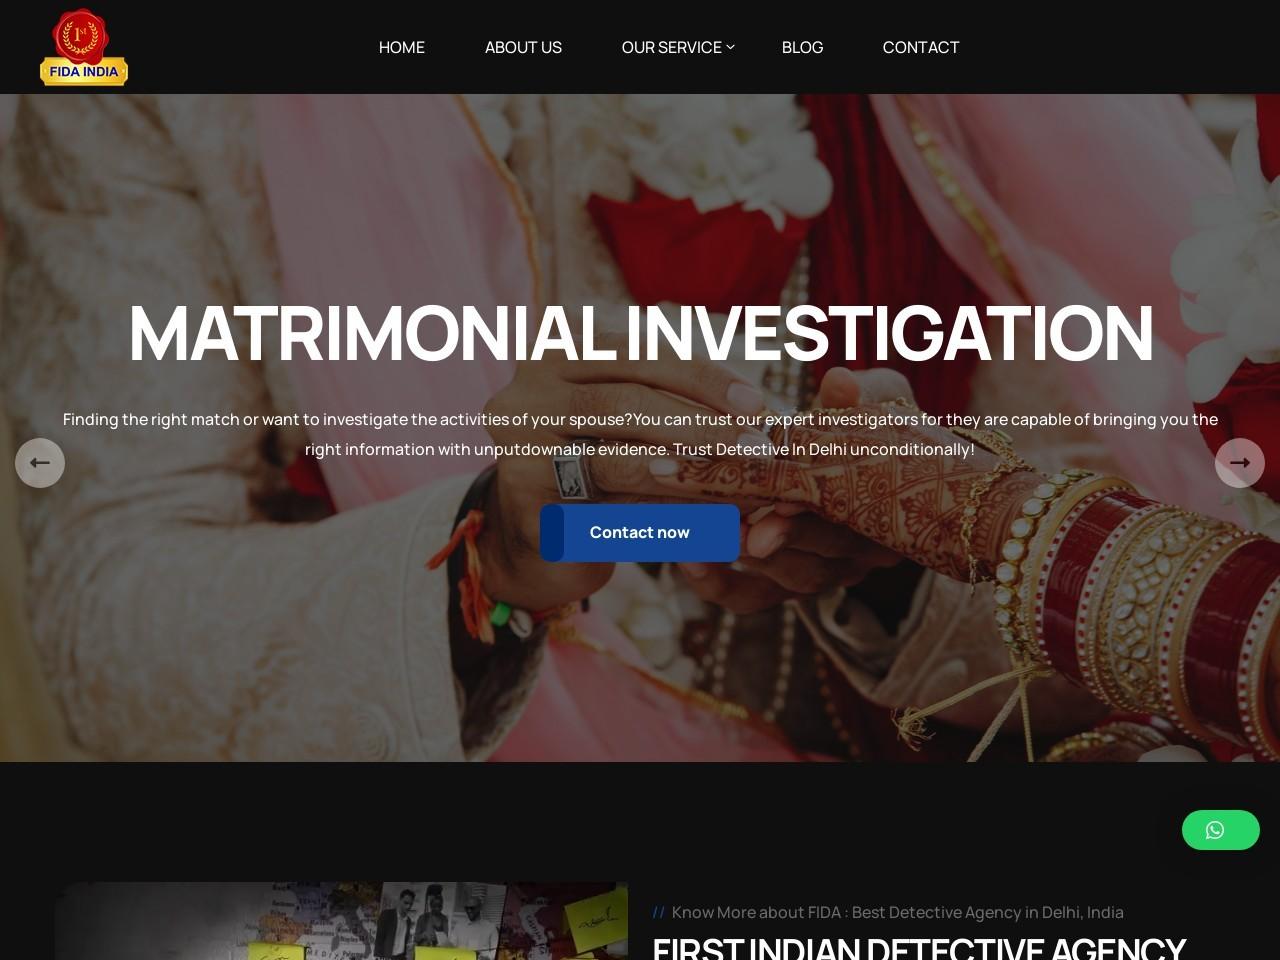 Top Secret Post Matrimonial Detective Agency – FIDA